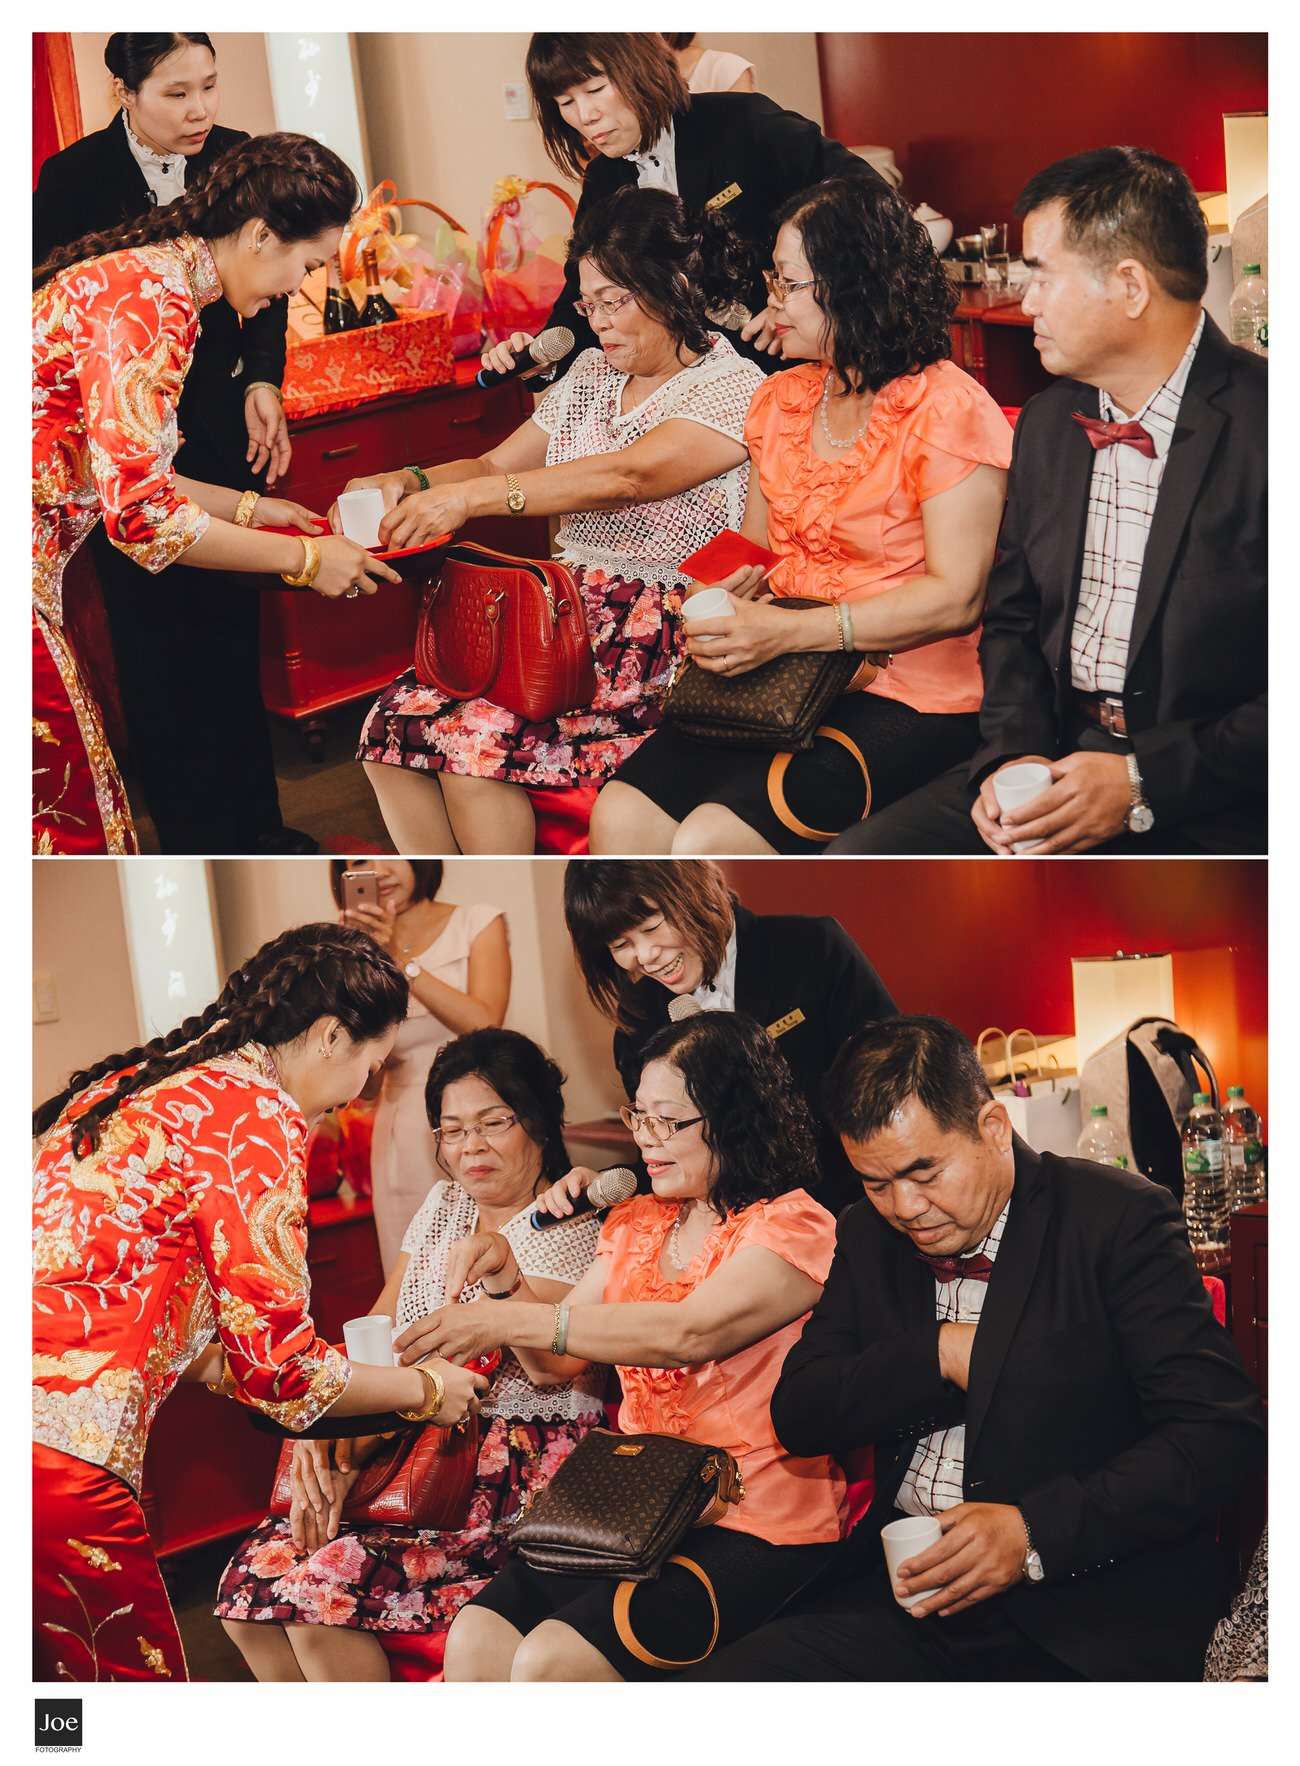 grand-hilai-hotel-wedding-daniel-yvette-joe-fotography-035.jpg